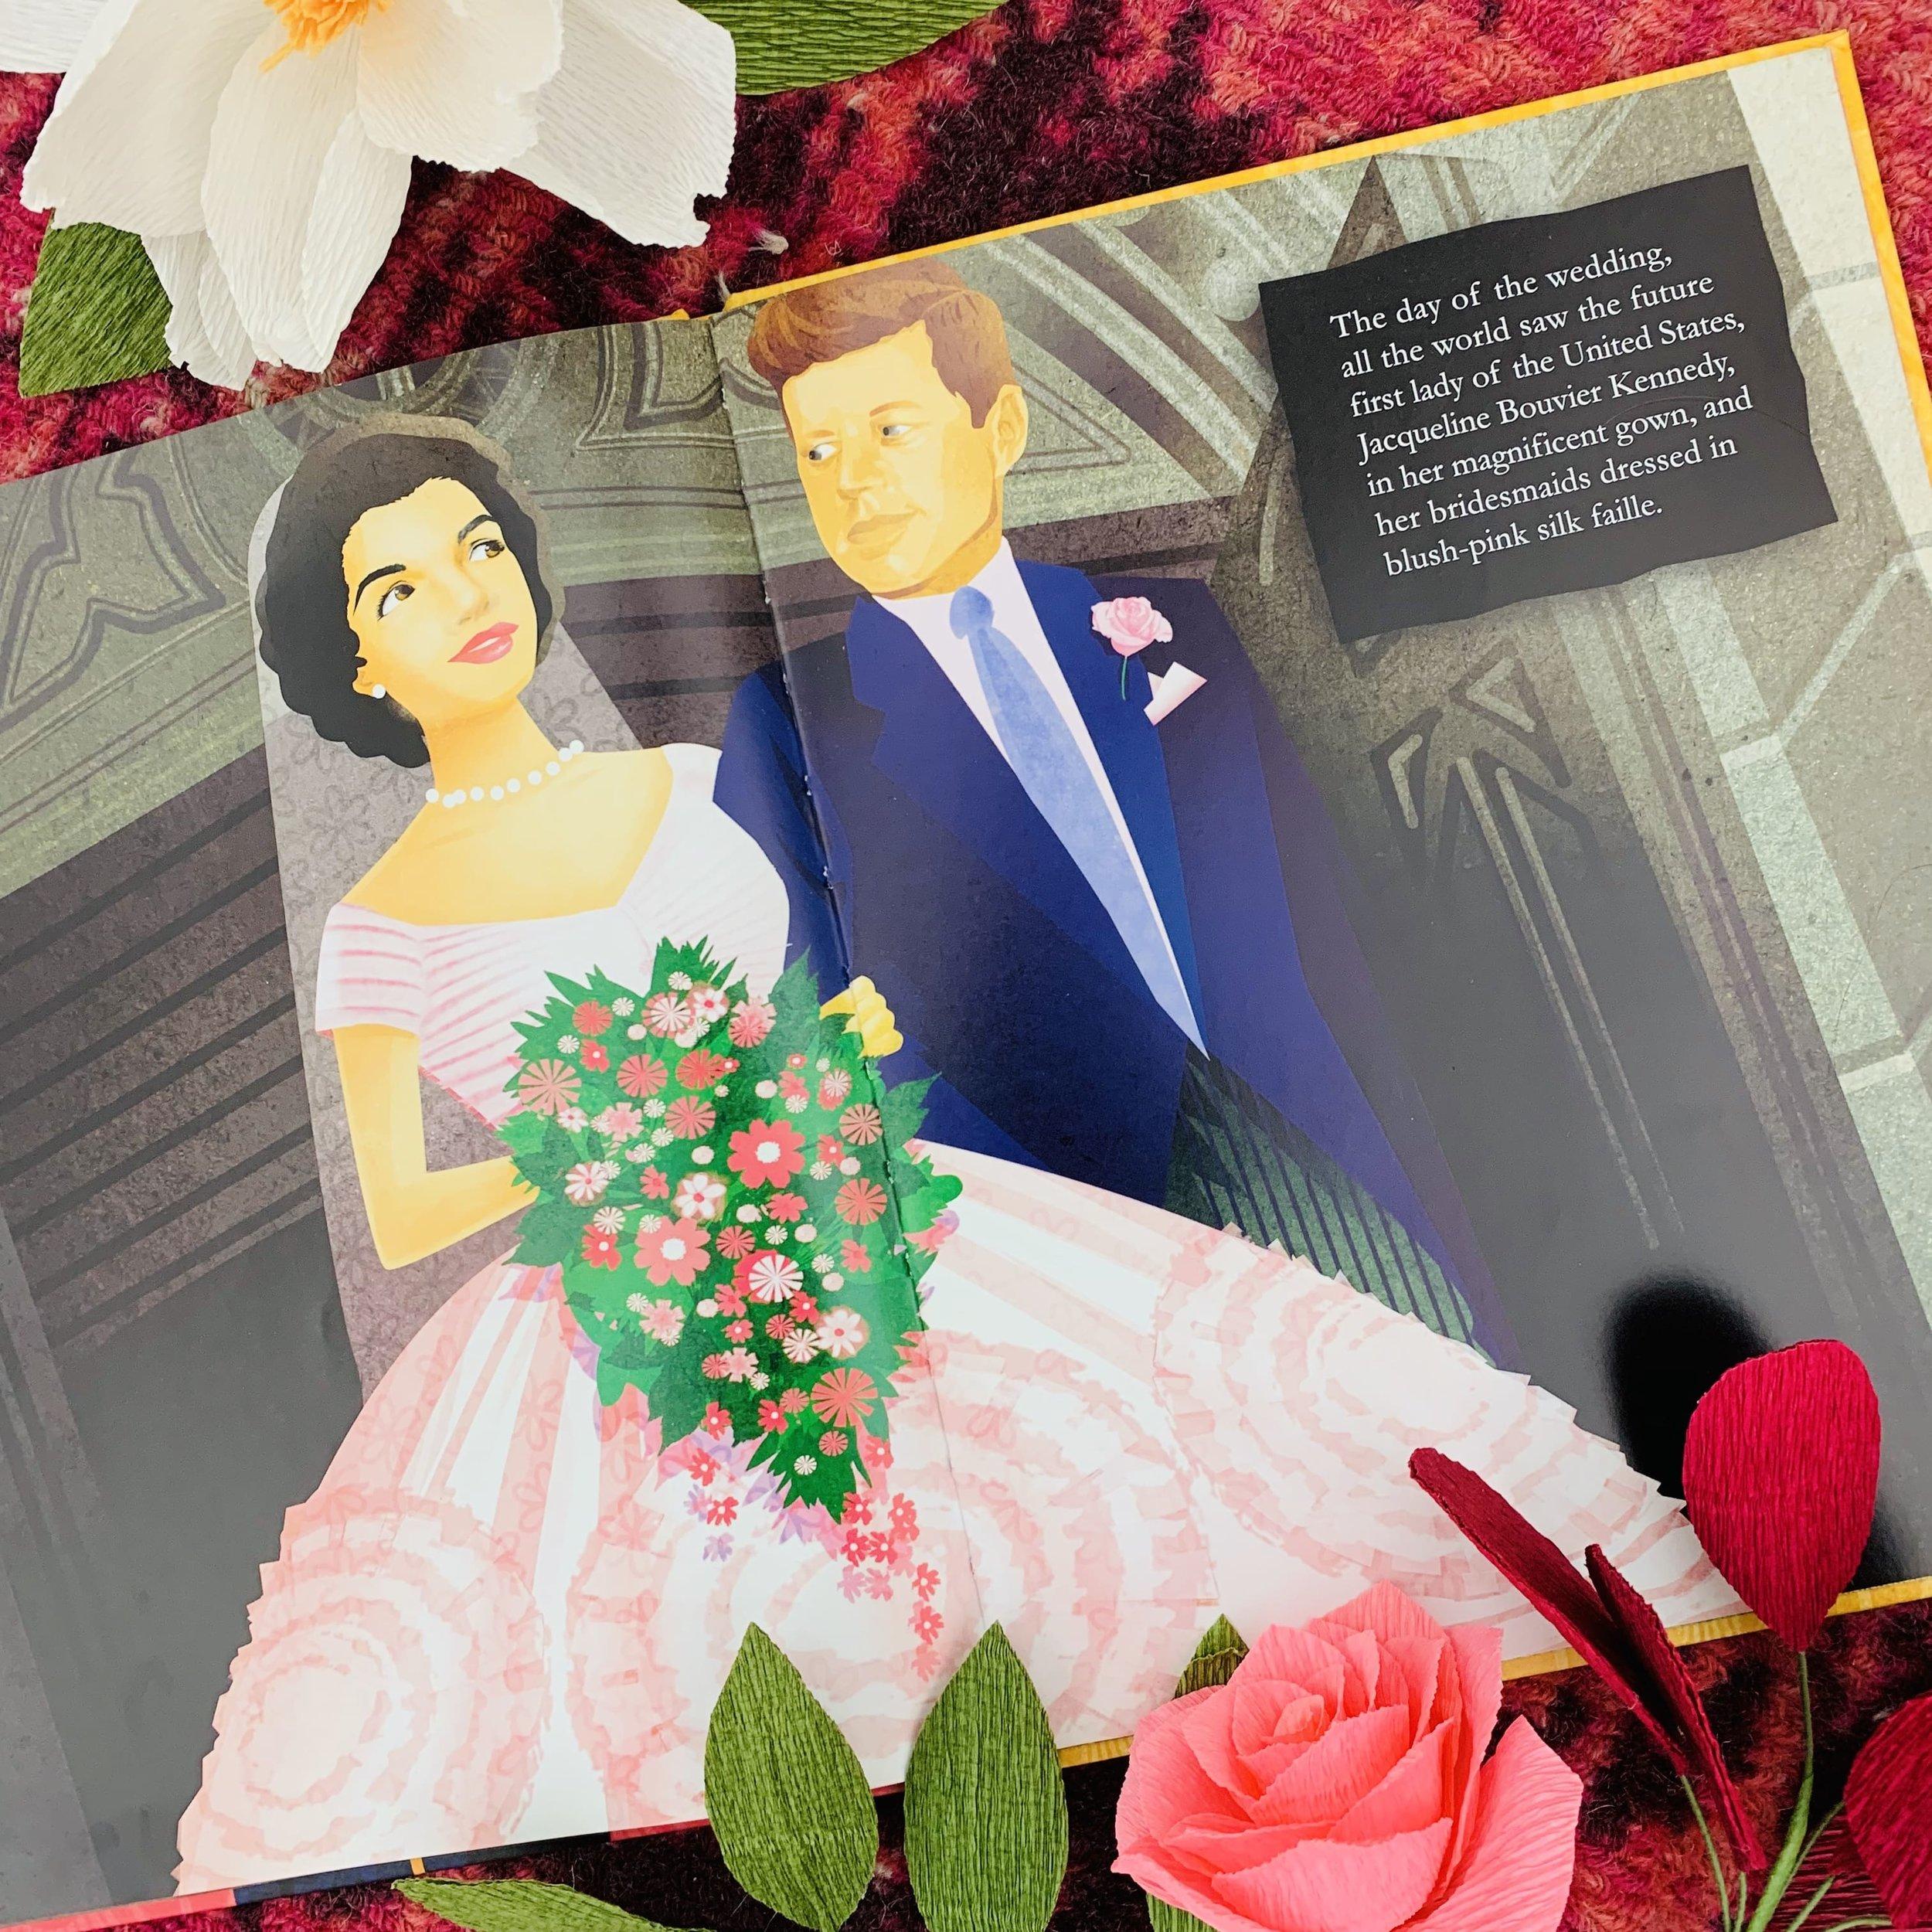 Anne Cole Lowe designed Jacqueline Kennedy's wedding dress